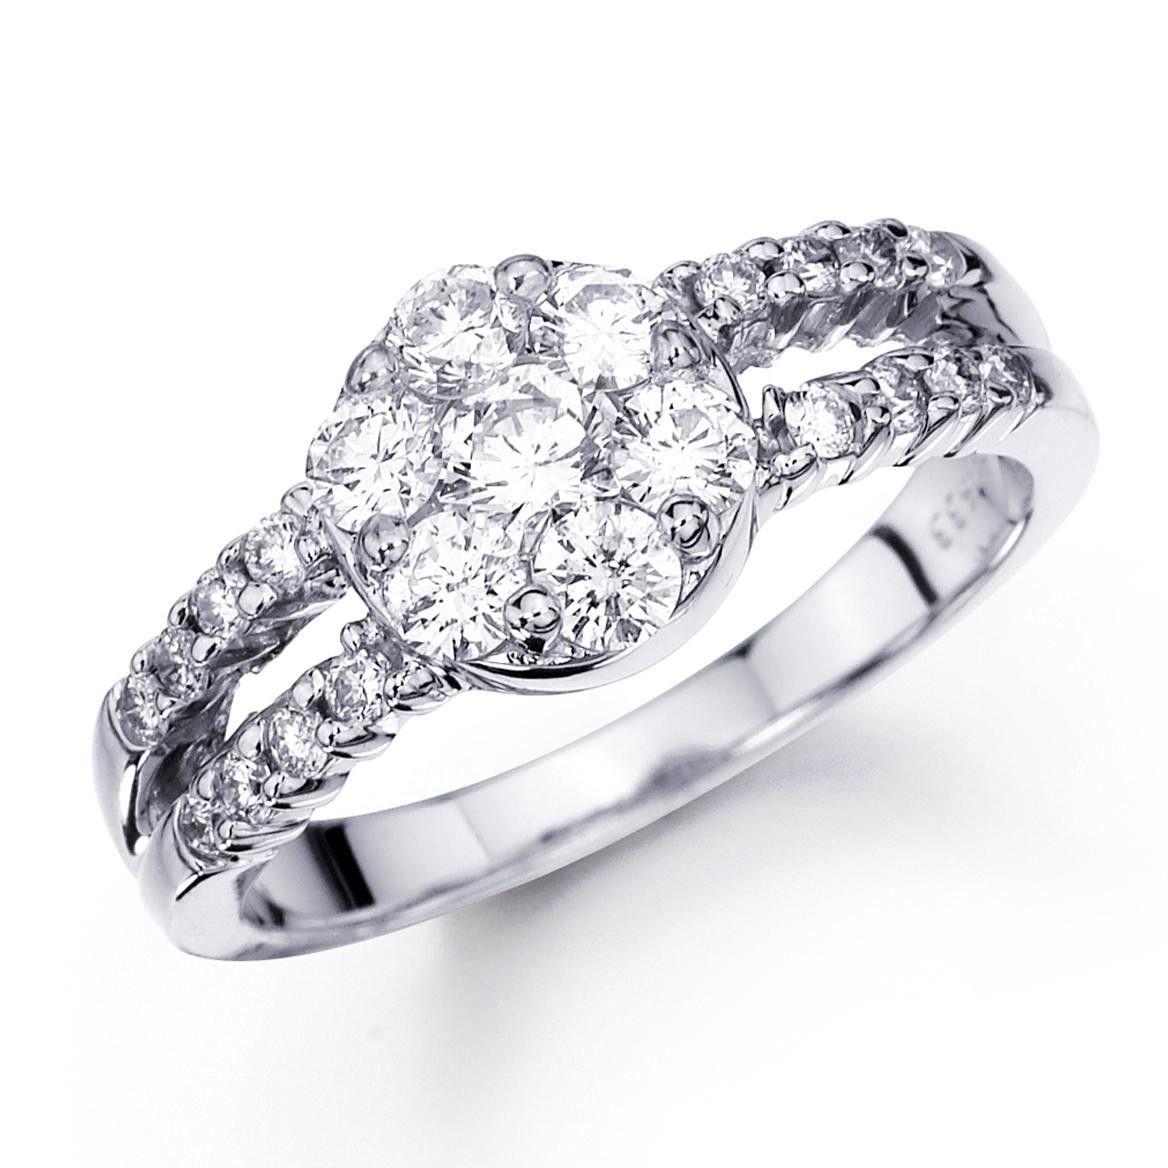 Beautiful Diamond Ring 45 Love it! Diamond wedding